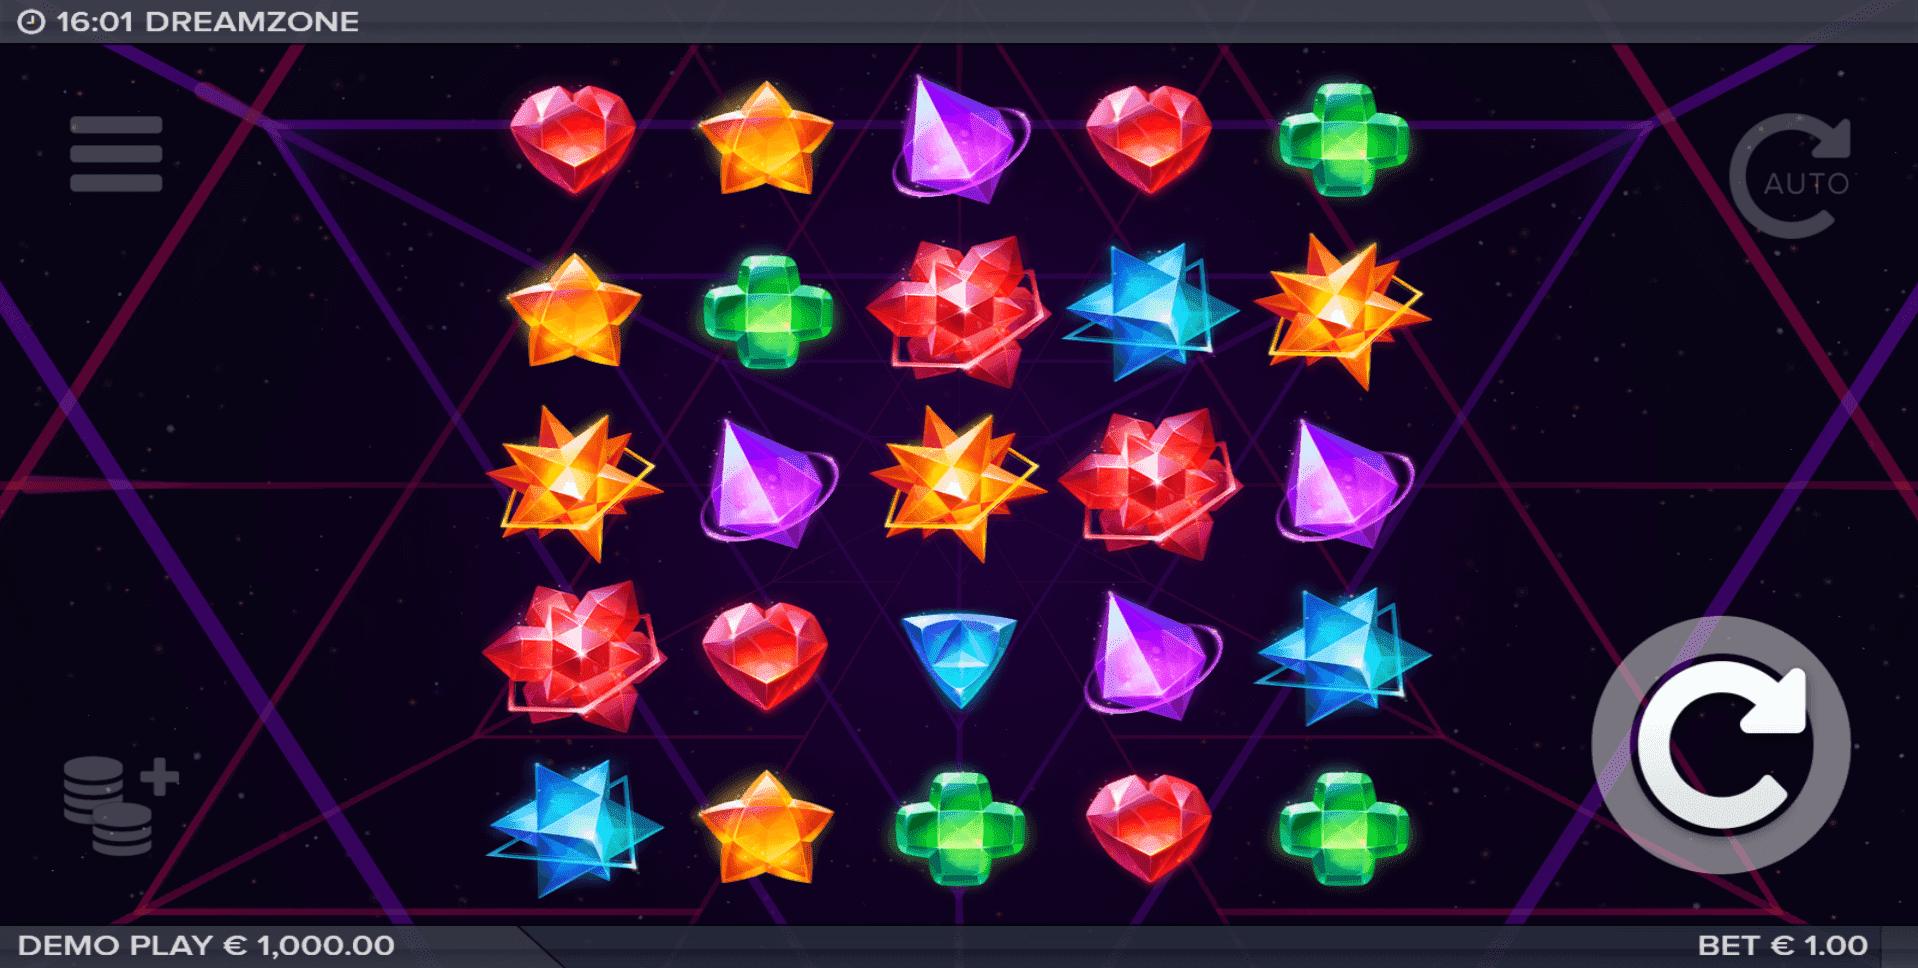 Dreamzone slot machine screenshot